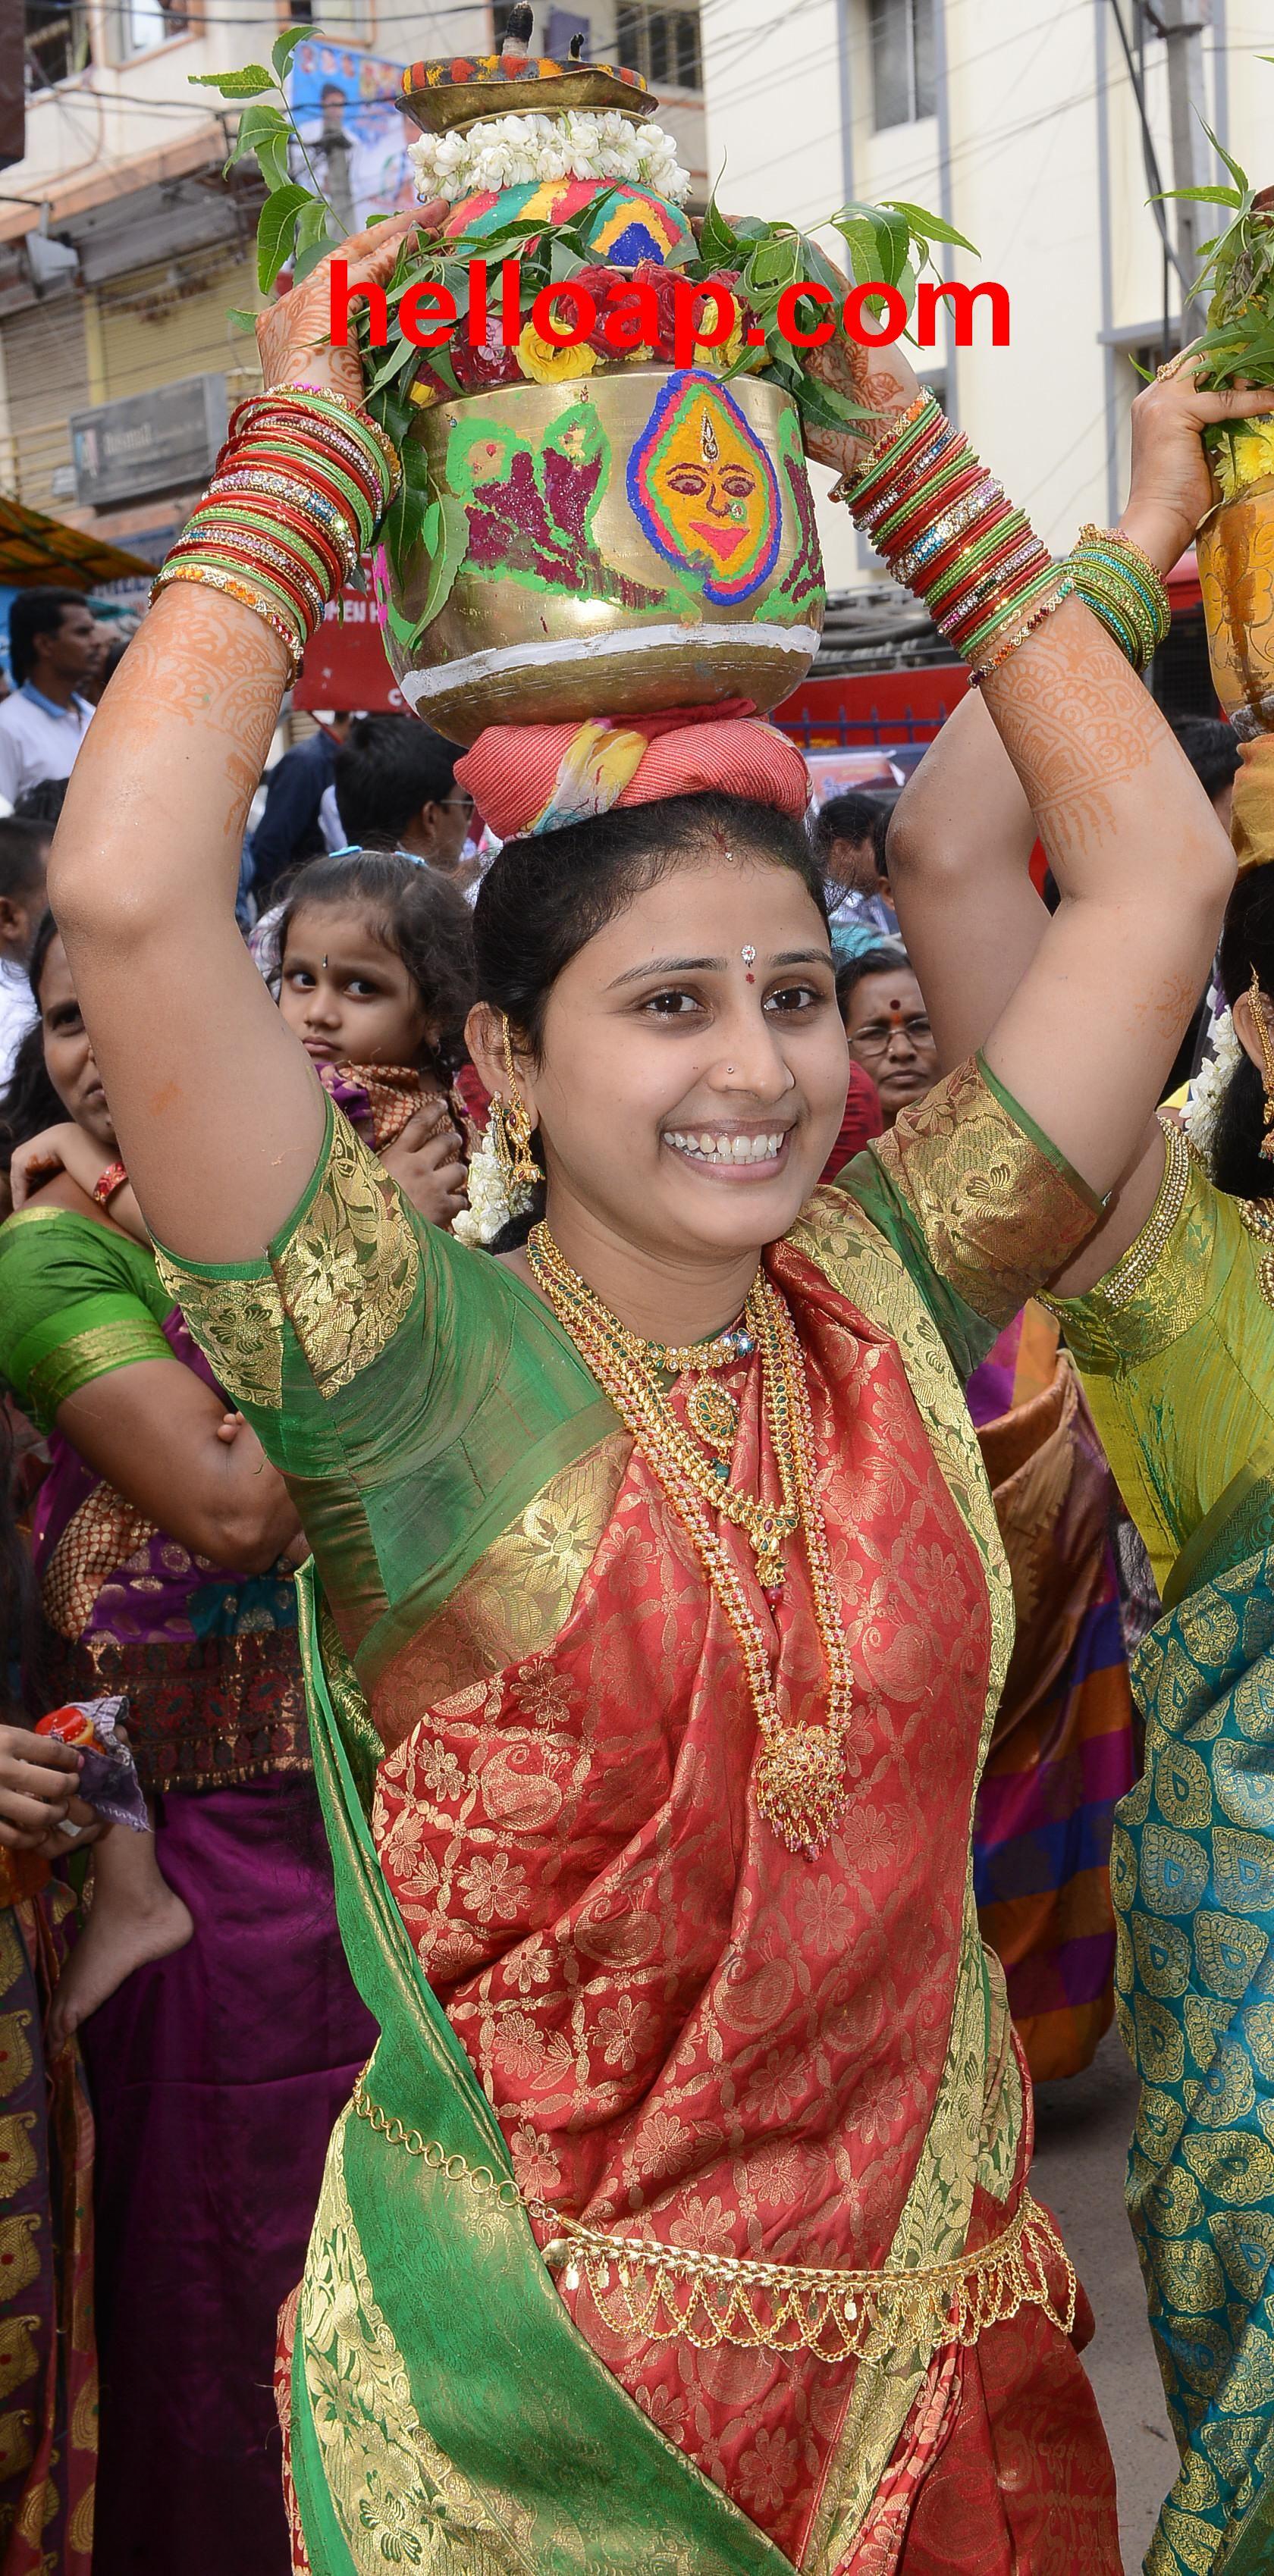 Telugu hyderabad old city aunty exposed in movie theatre 10